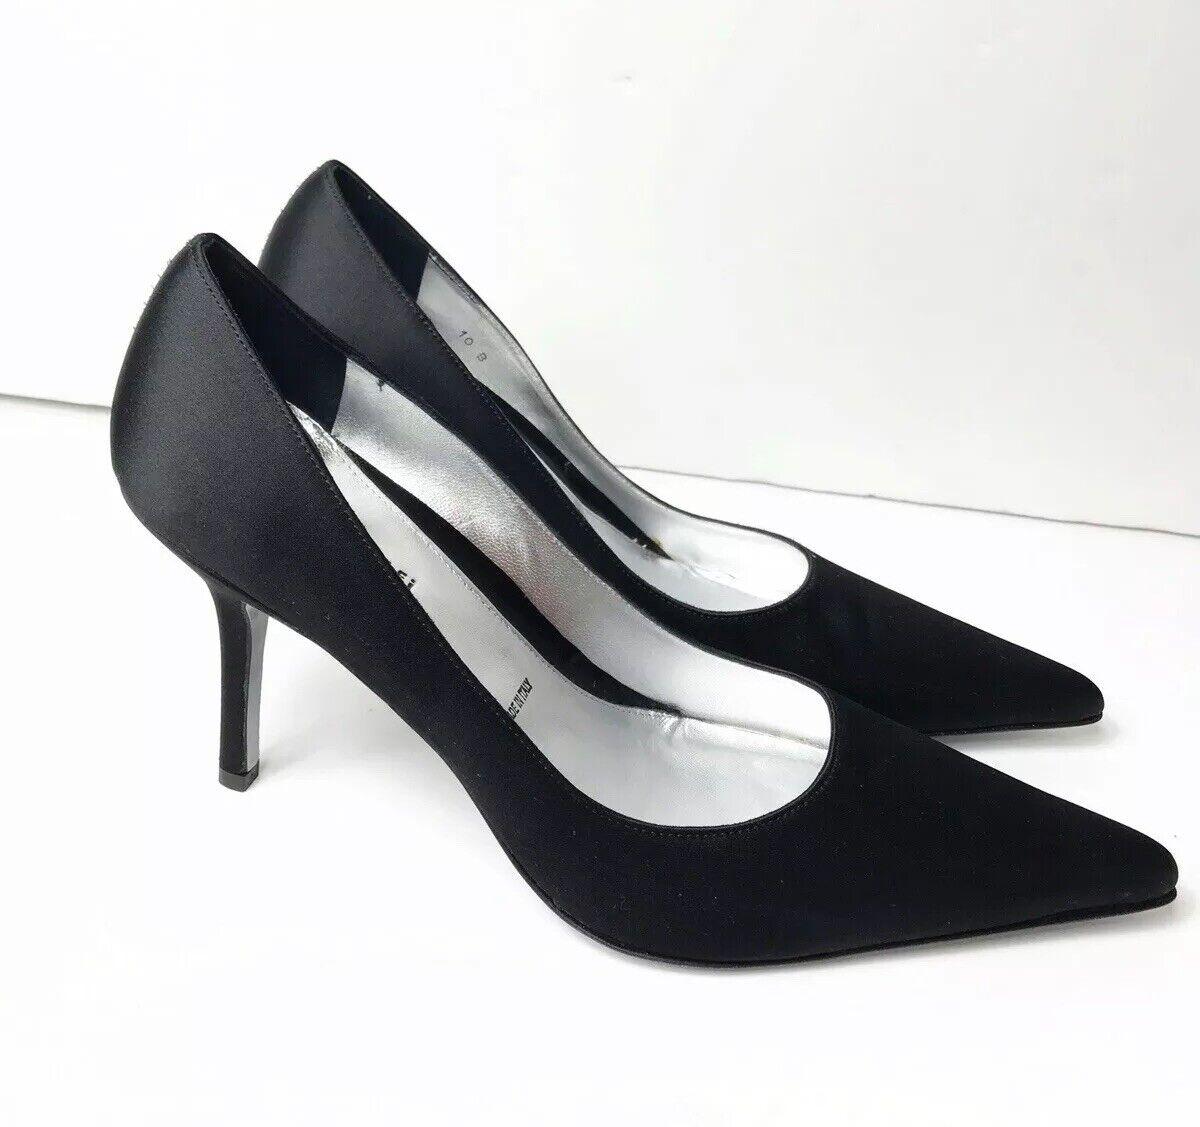 Amalfi 10 Black Satin Stiletto Heels Pumps Pointed Toe Vero Cuoio   250